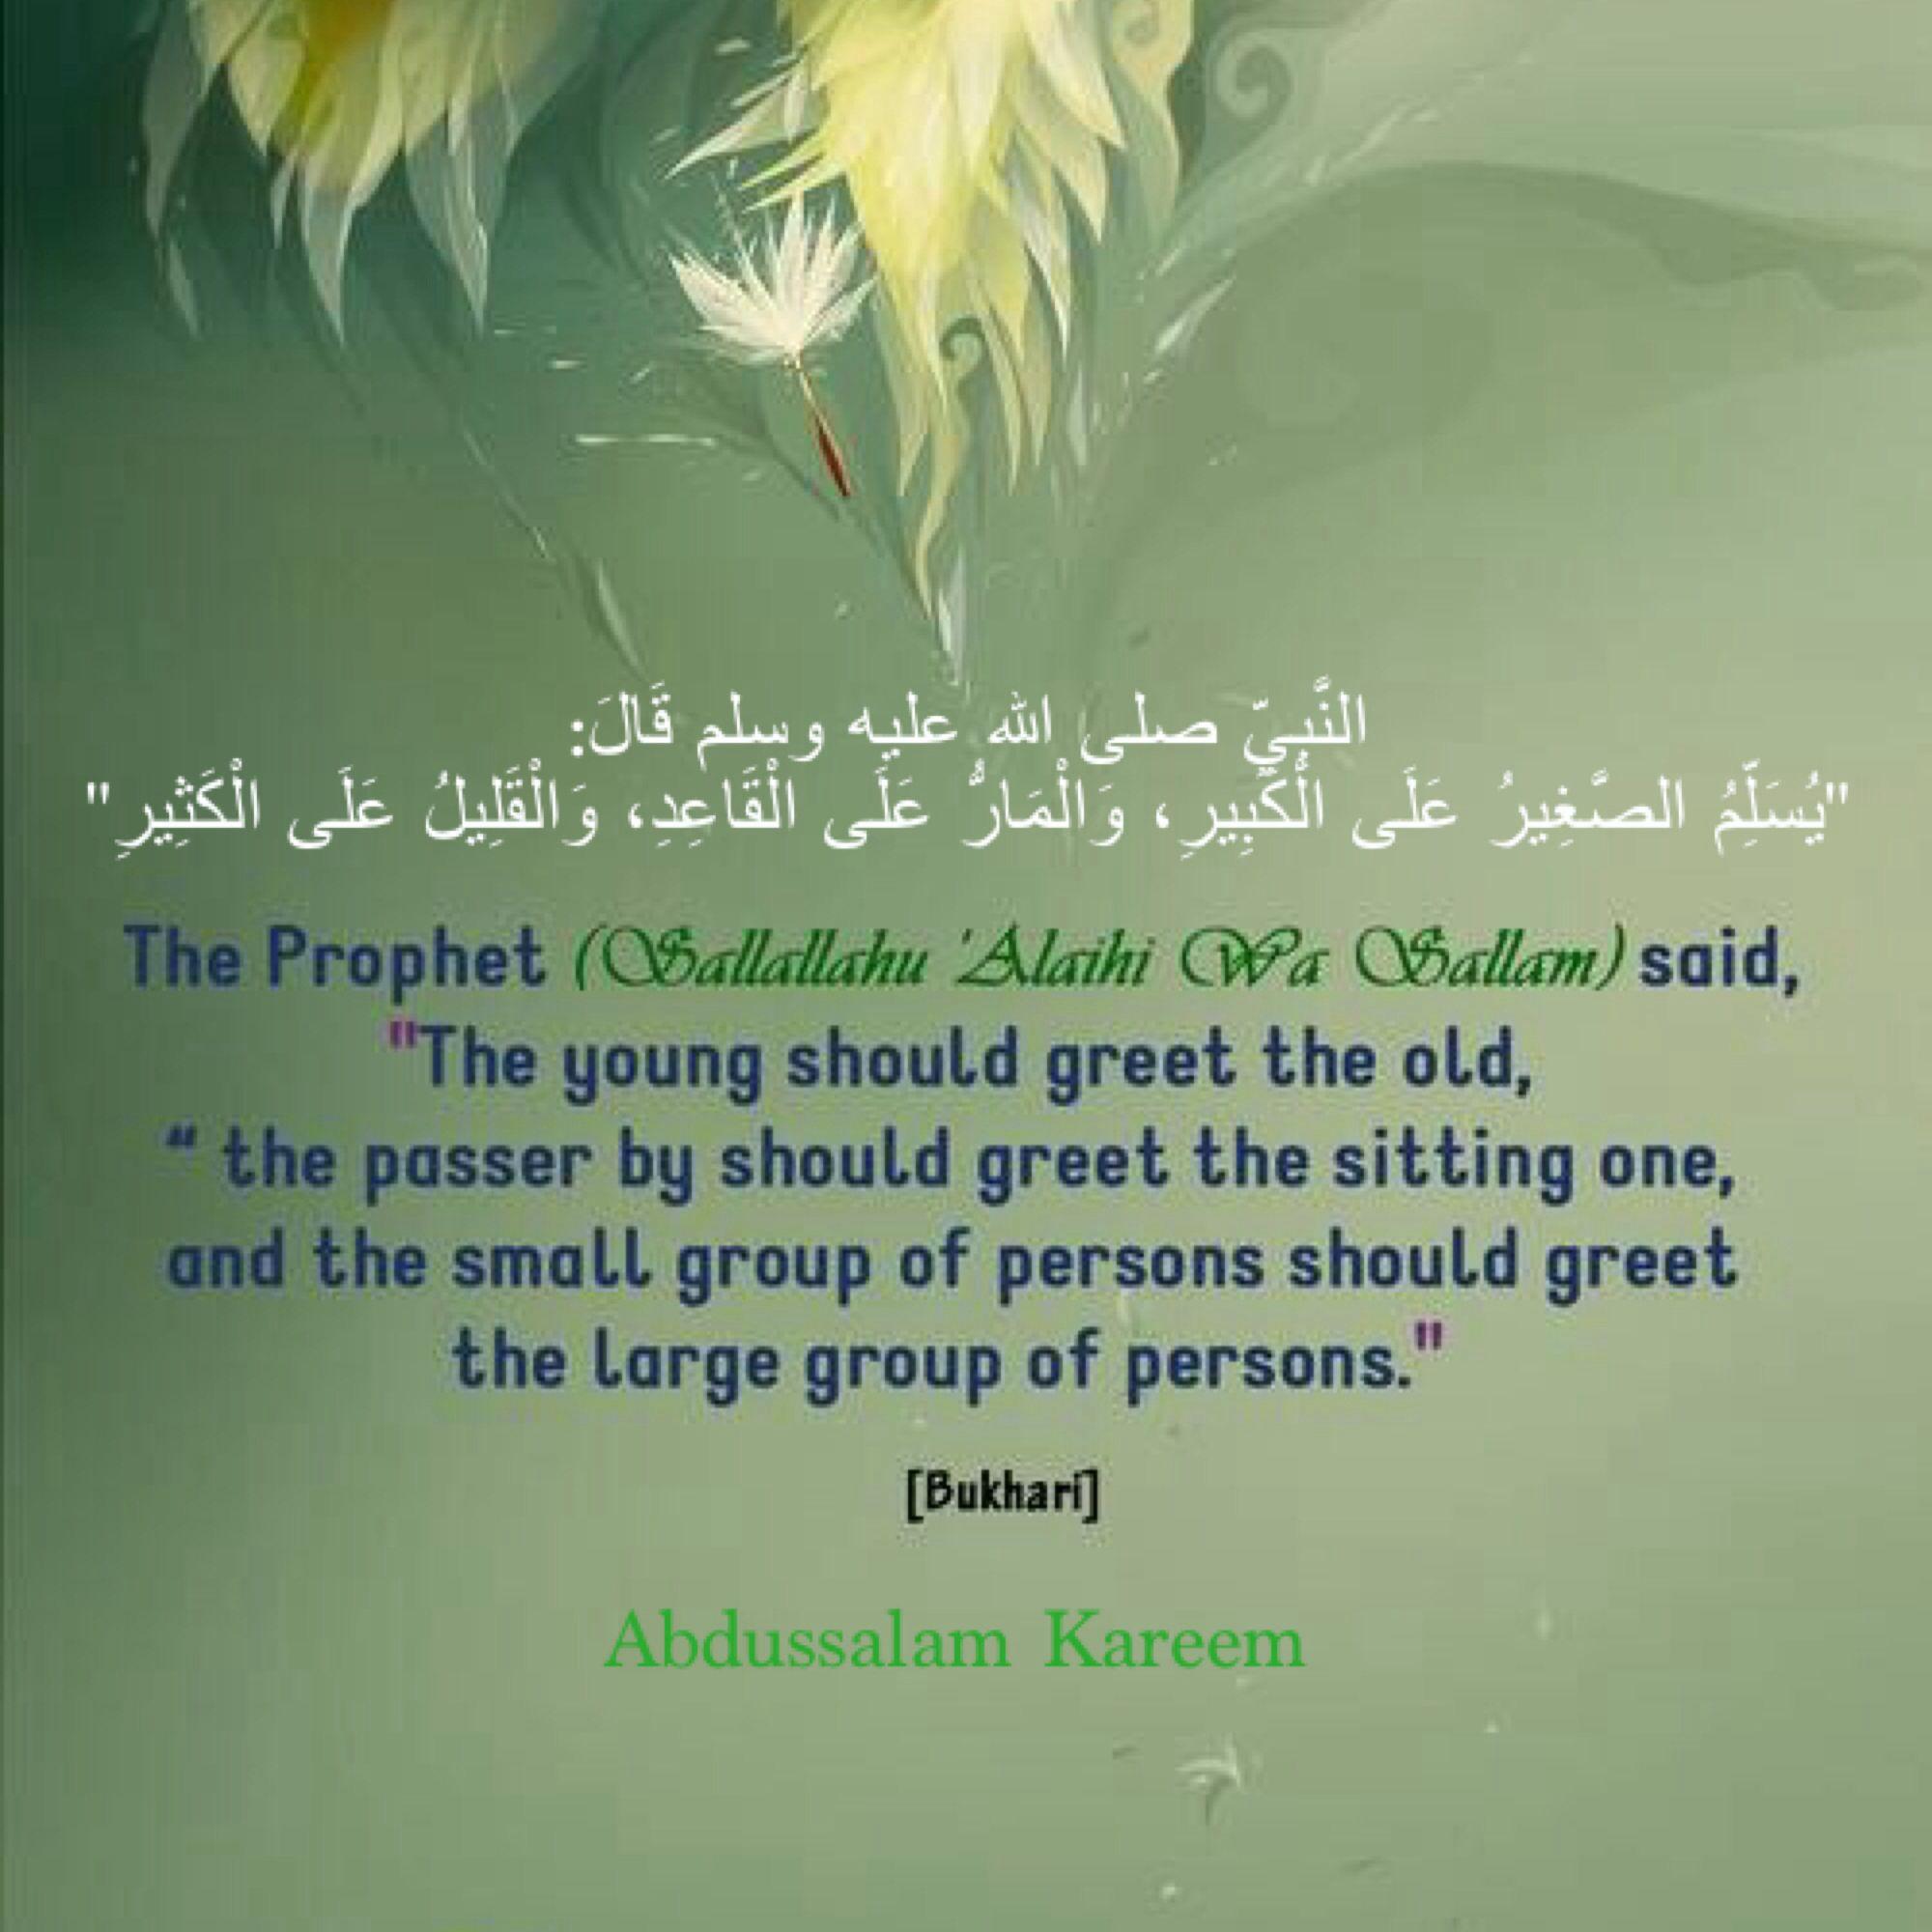 السلام عليكم ورحمة الله وبركاته Islamic Quotes Beautiful Islamic Quotes Hadith Quotes